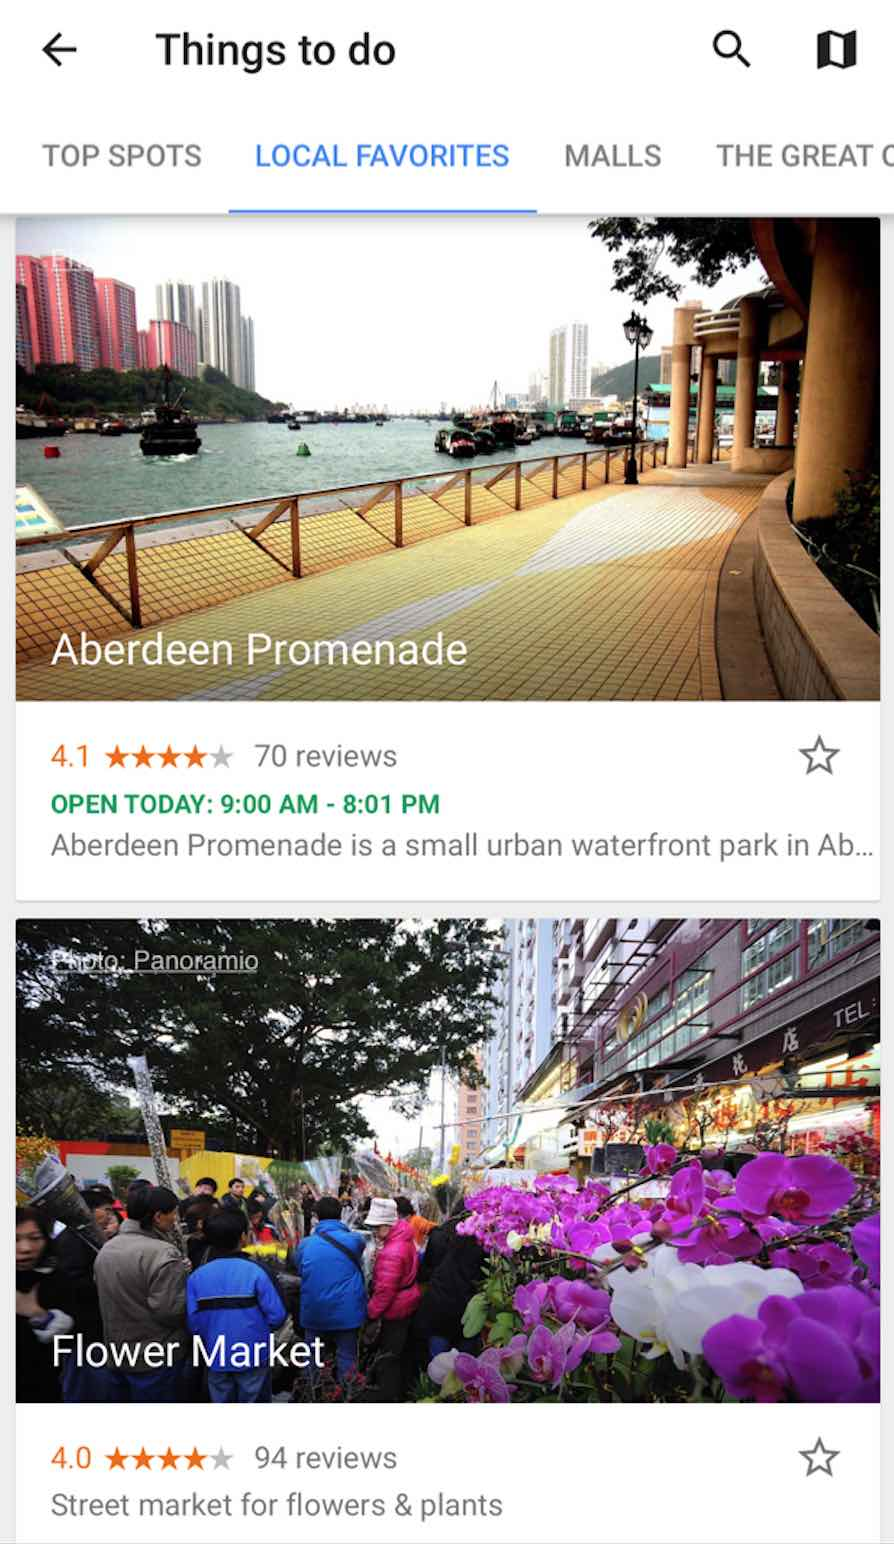 google-trips-local-favourites-aspirantsg